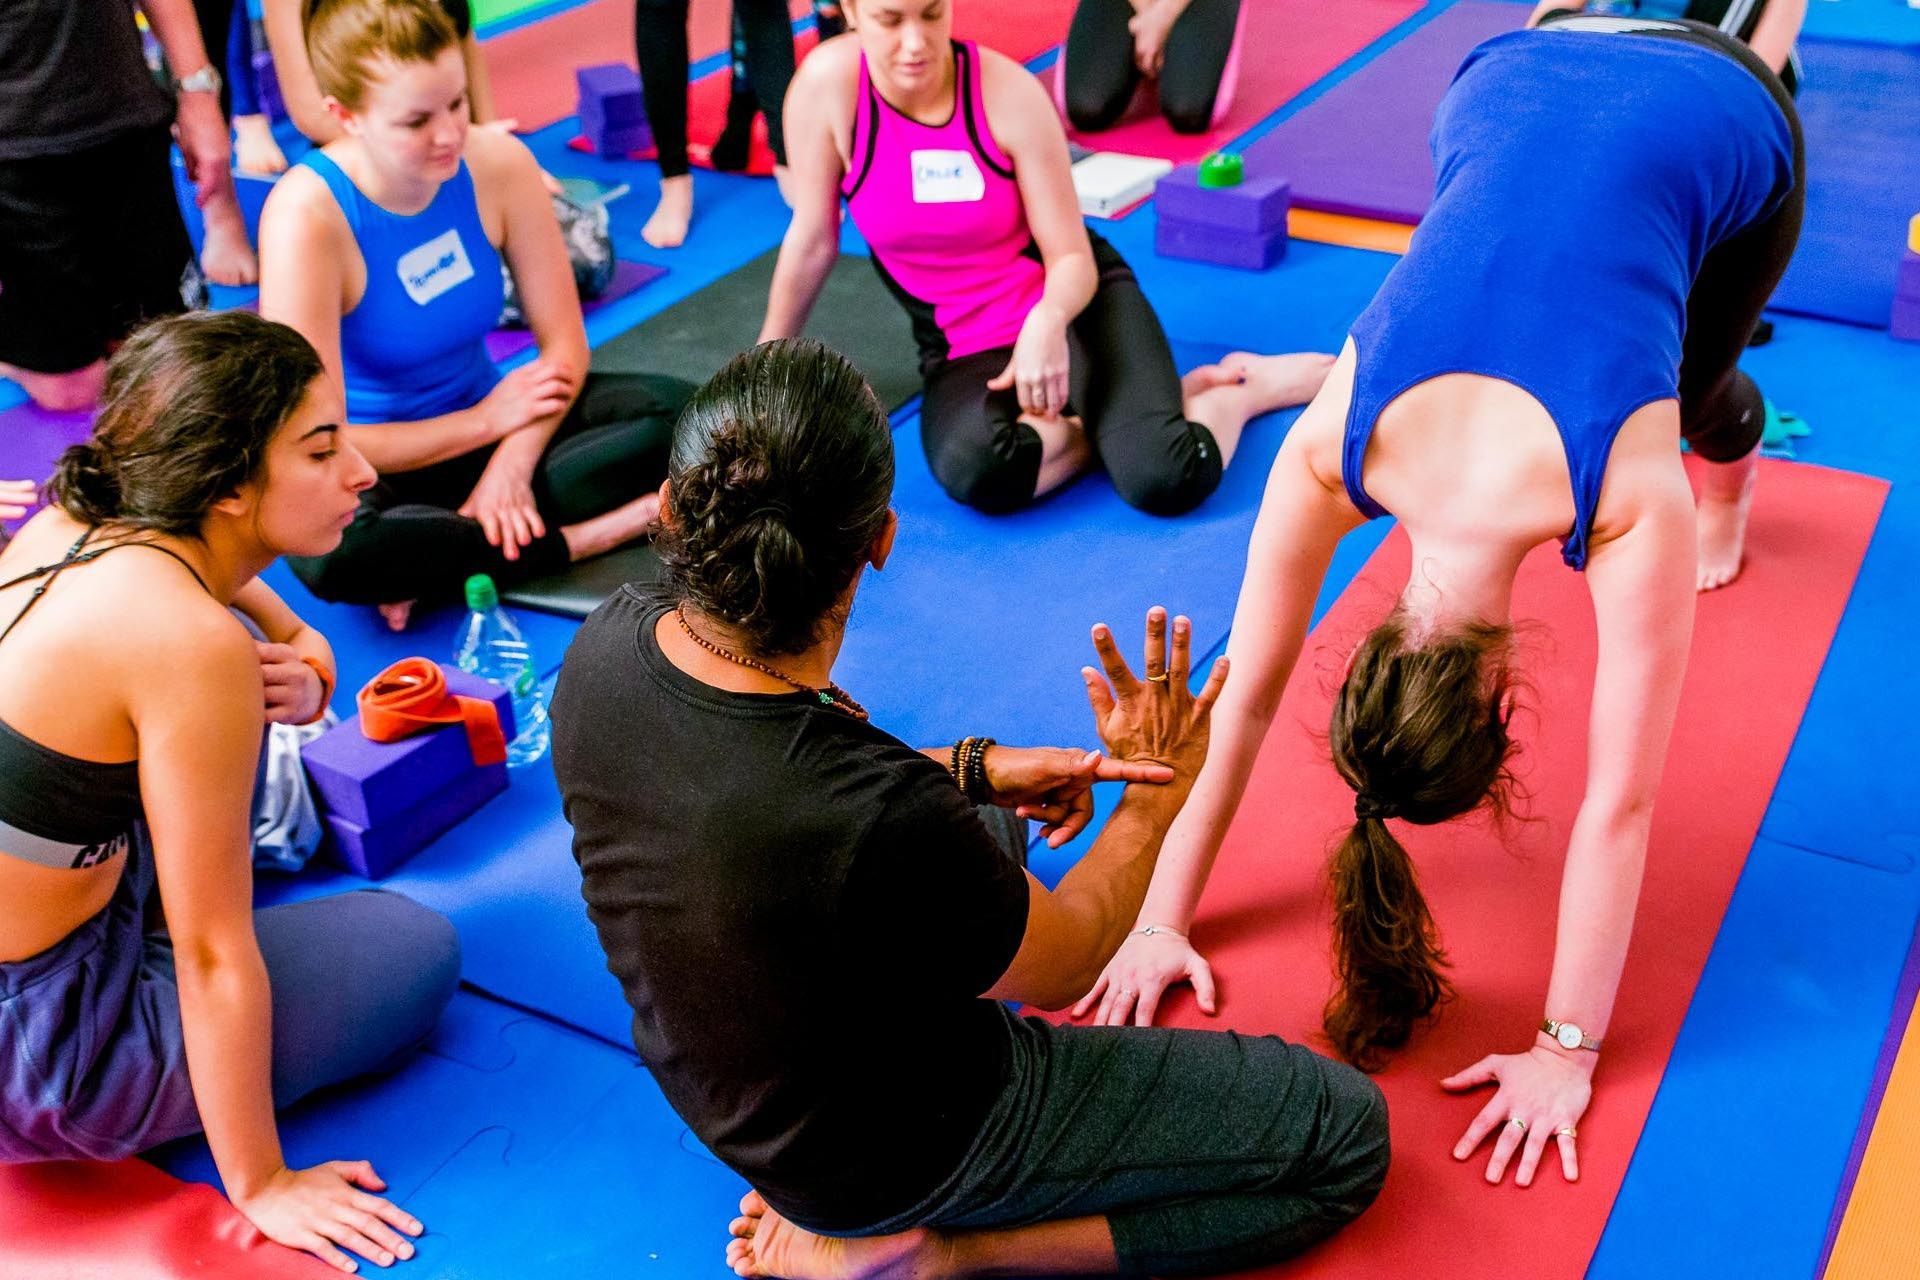 sites/37887149/LLiV-Beginners-Yoga-Workshop.jpg